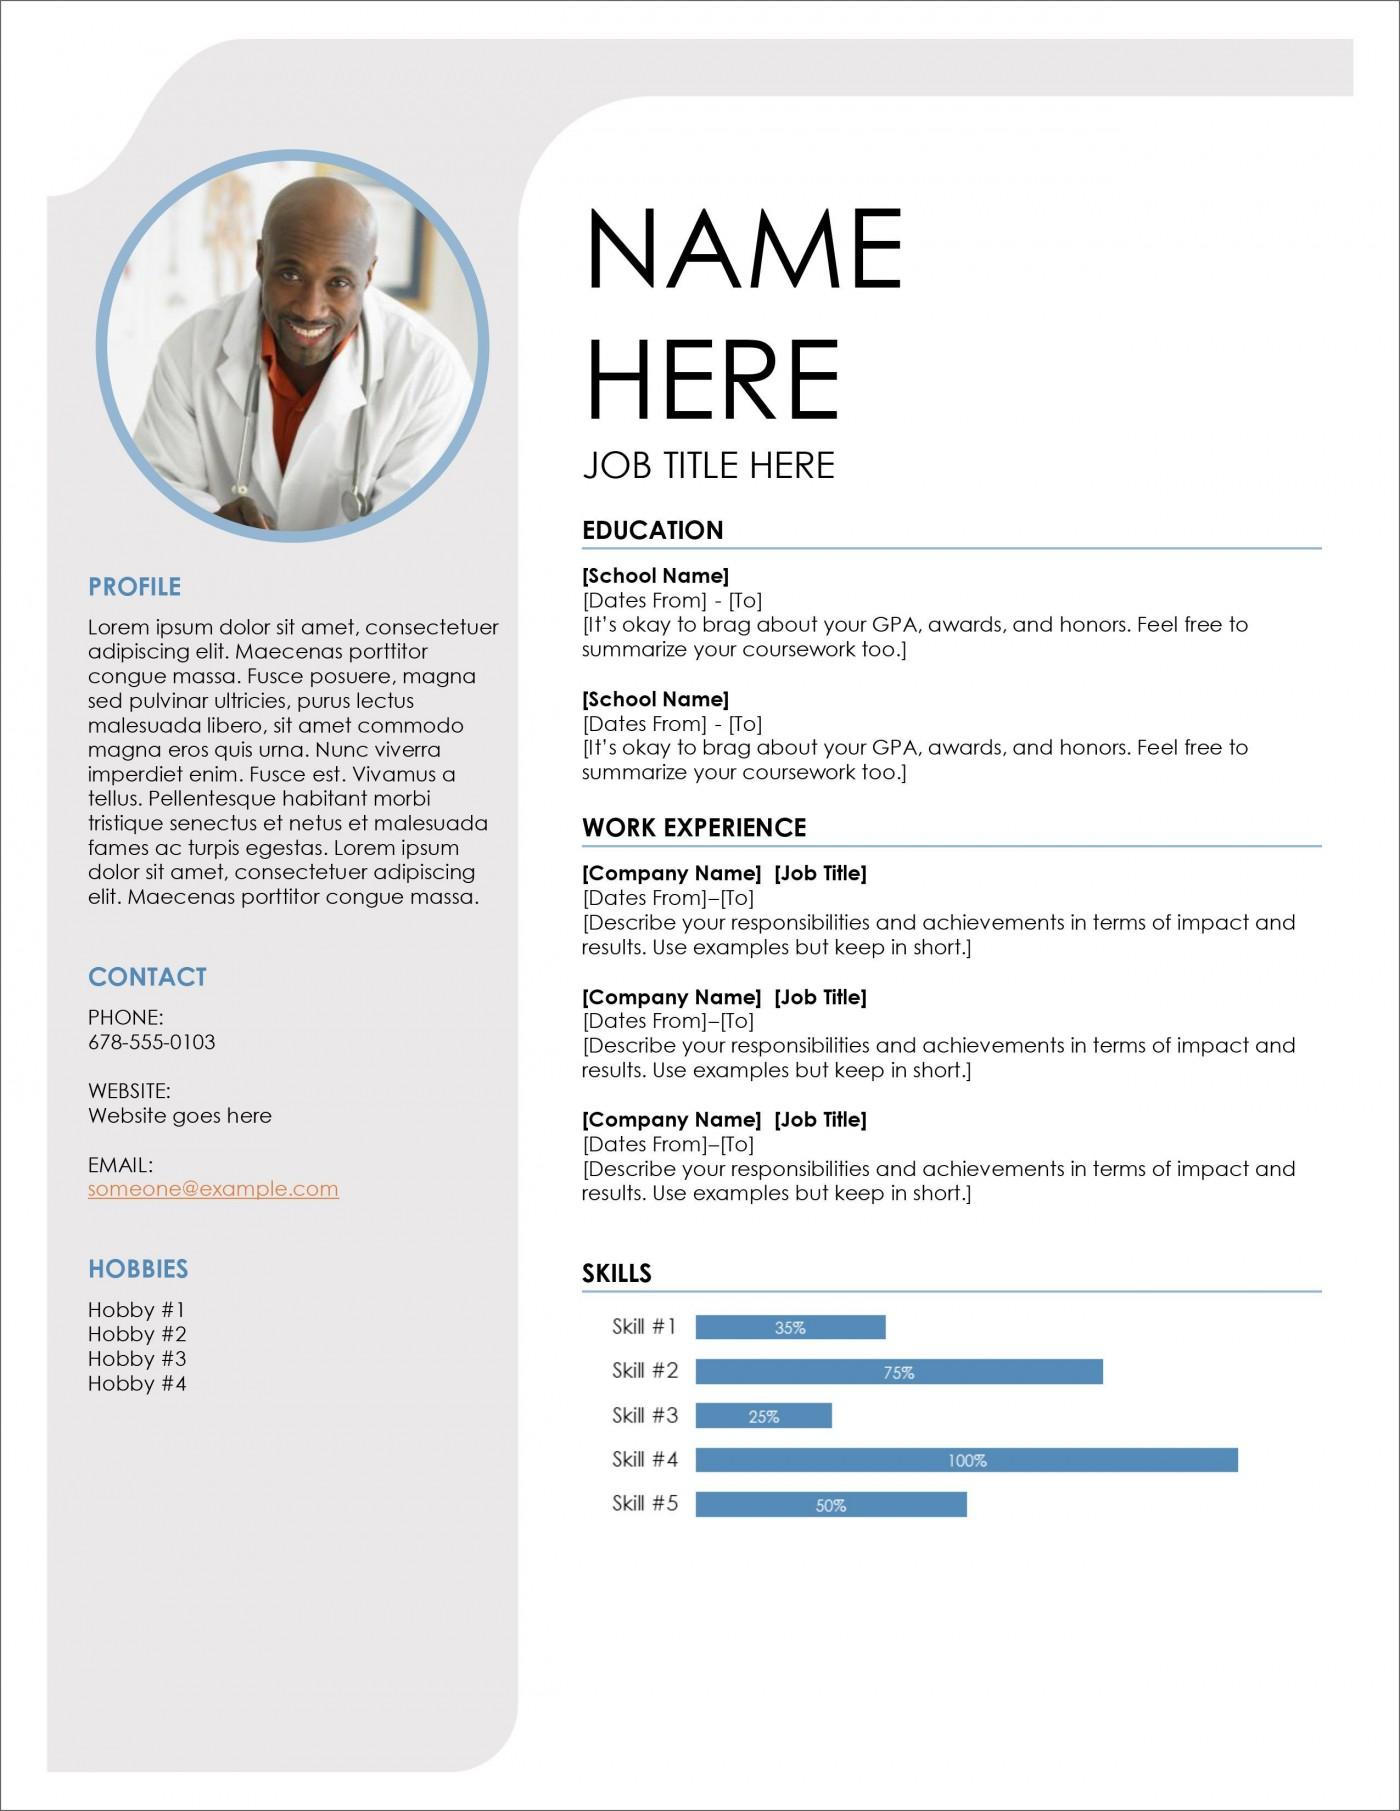 005 Wonderful Download Resume Template Microsoft Word Photo  Free 2007 2010 Creative For Fresher1400